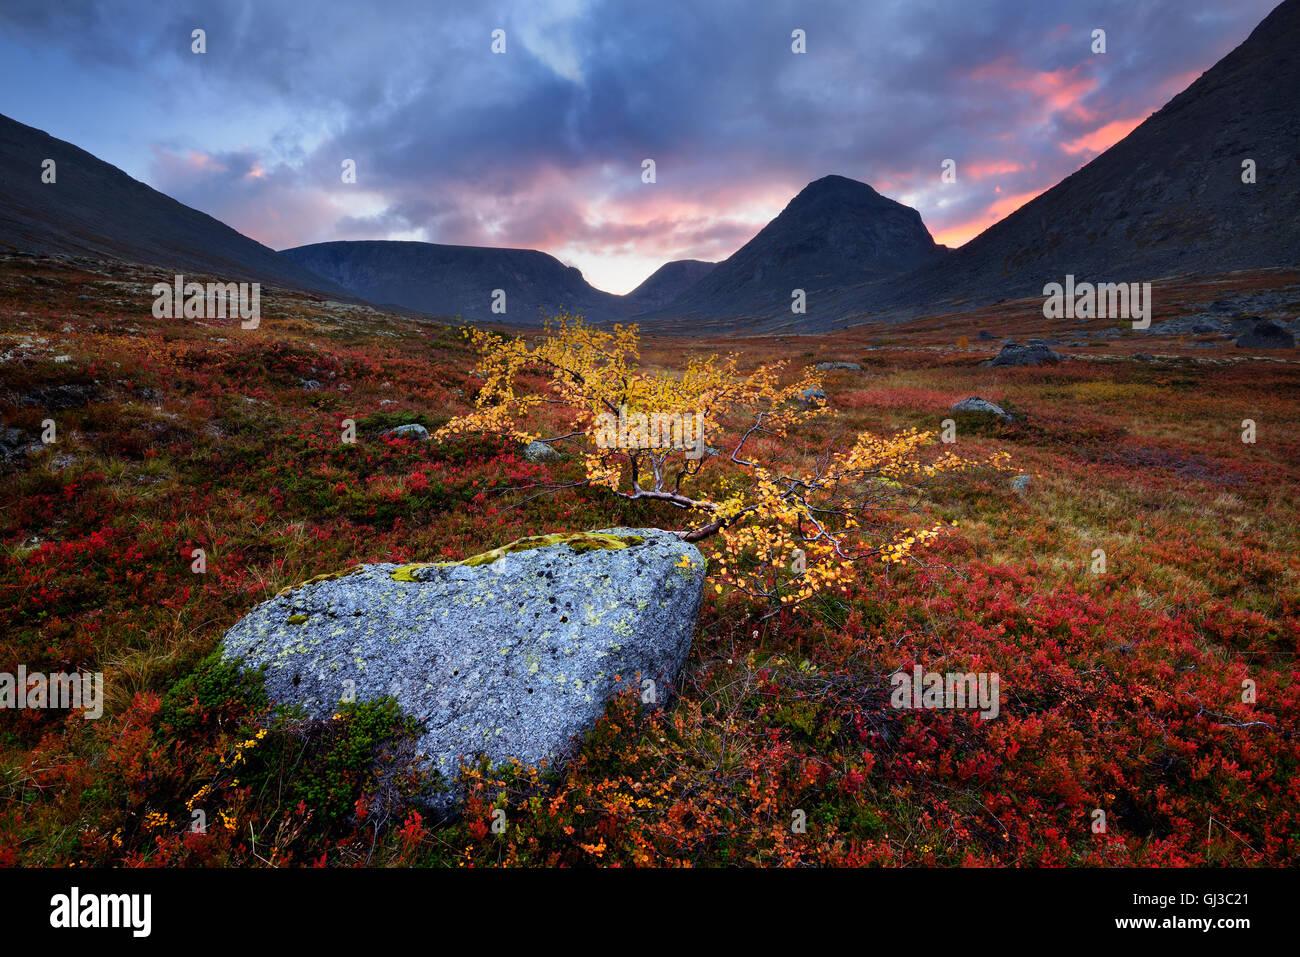 Autumn colours and boulder in Malaya Belaya River valley at dusk, Khibiny mountains, Kola Peninsula, Russia - Stock Image